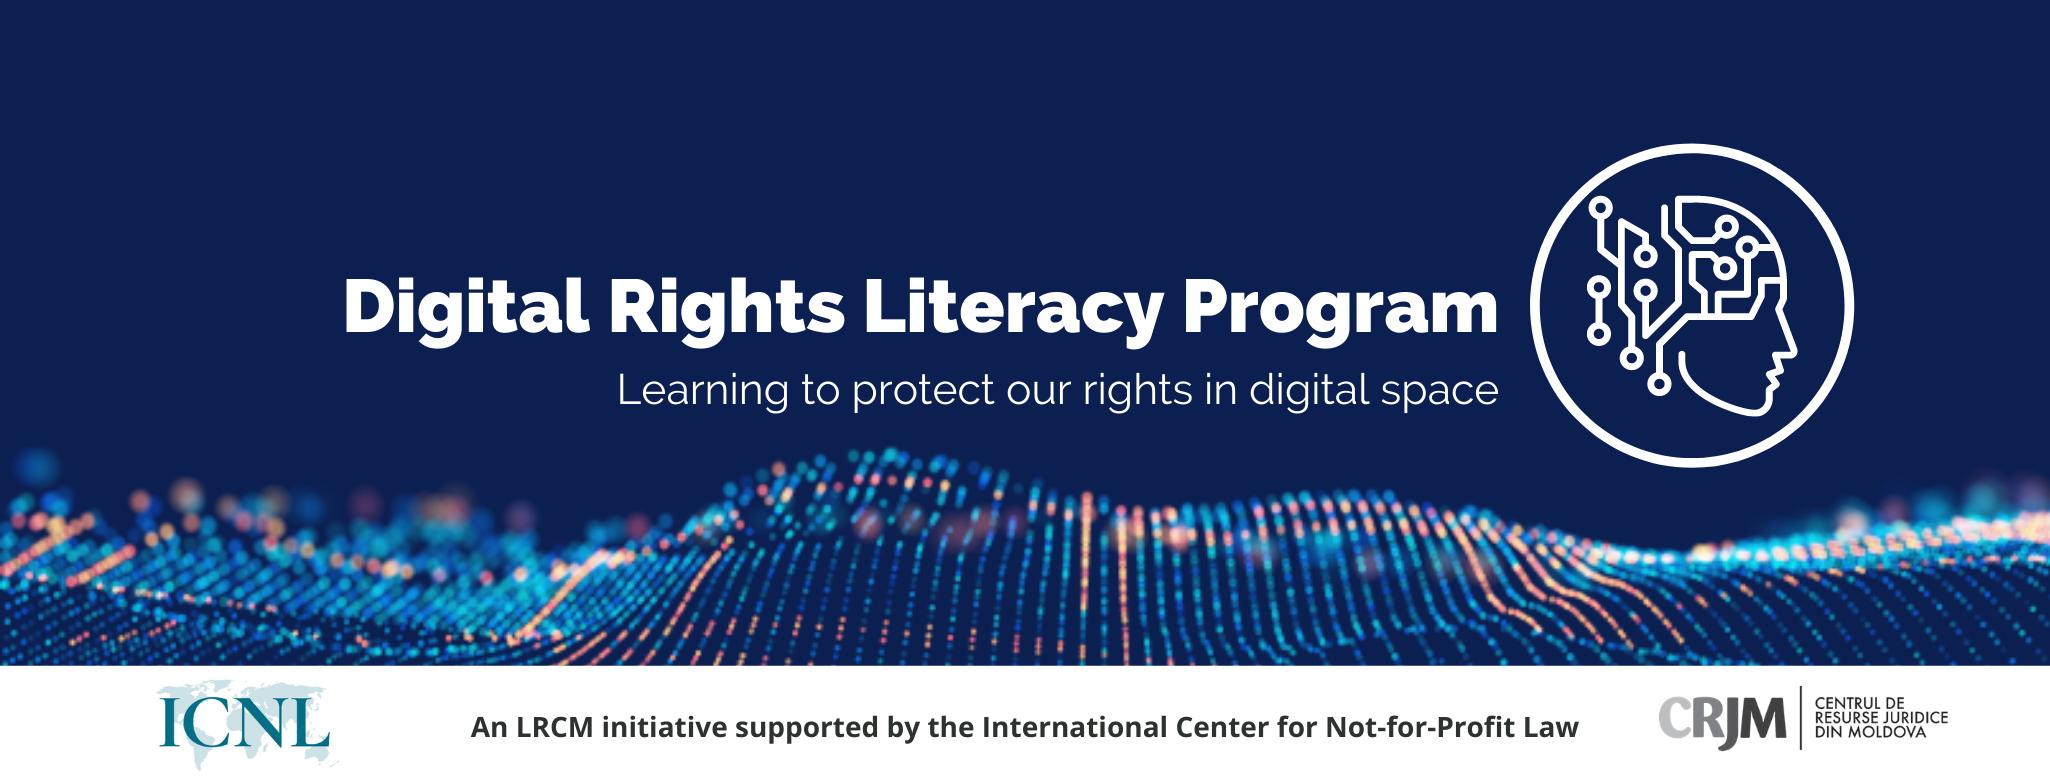 En digital rights cover